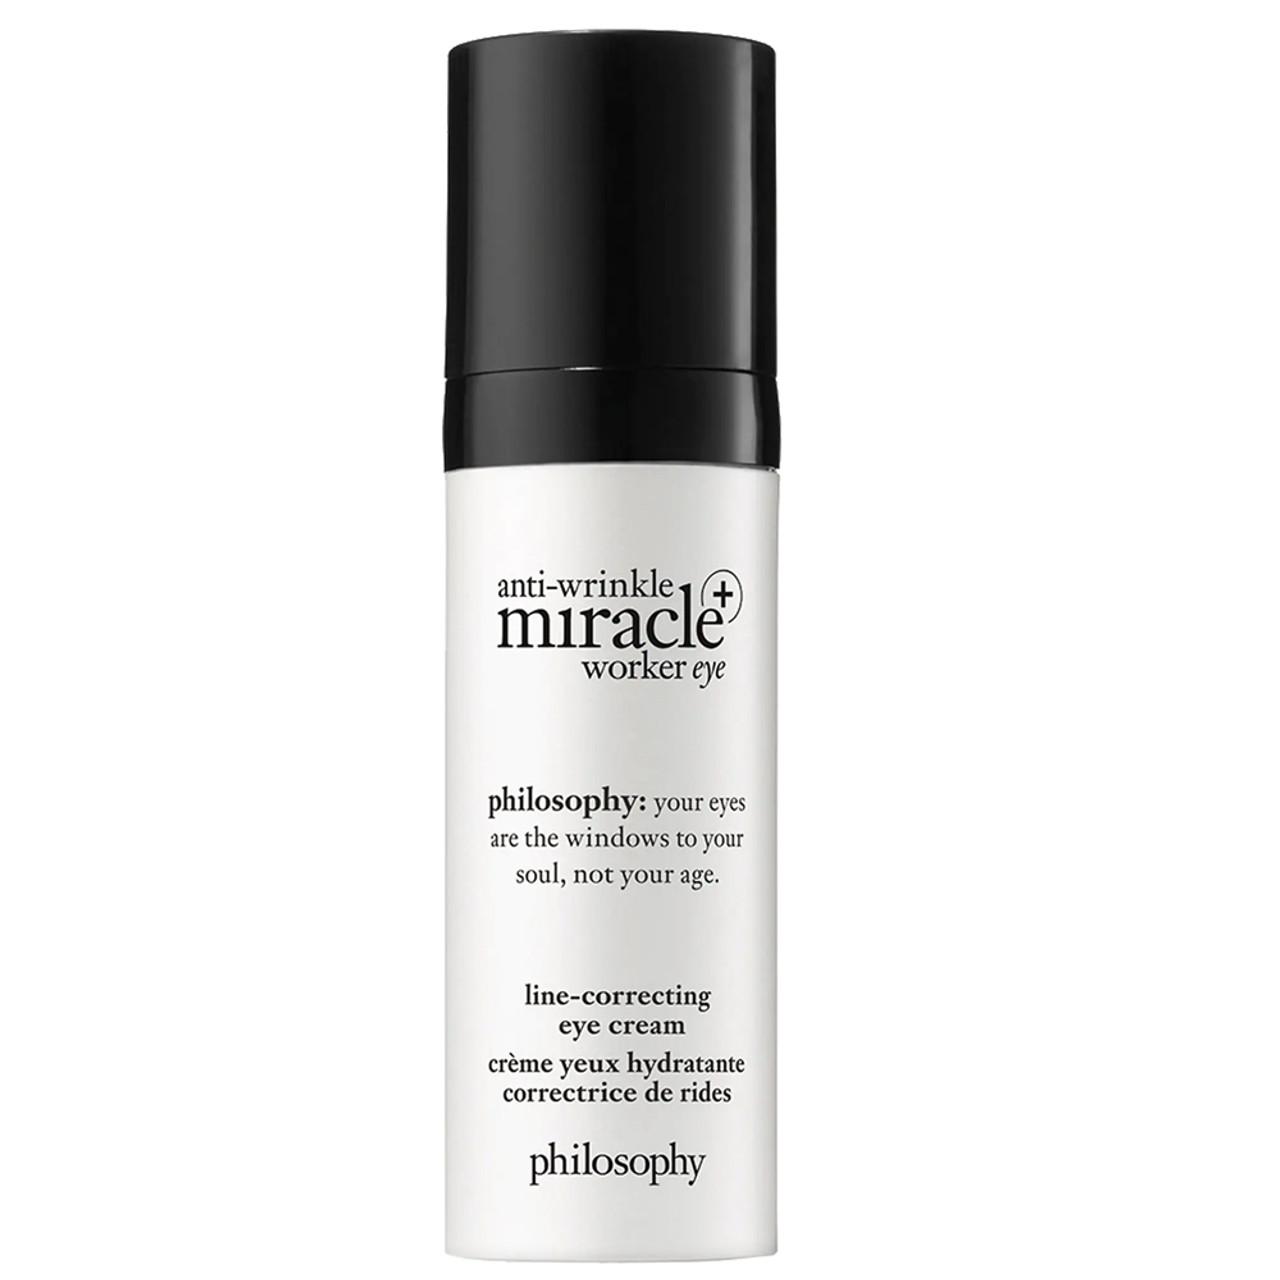 philosophy Anti-Wrinkle Miracle Worker+ Line Correcting Eye Cream